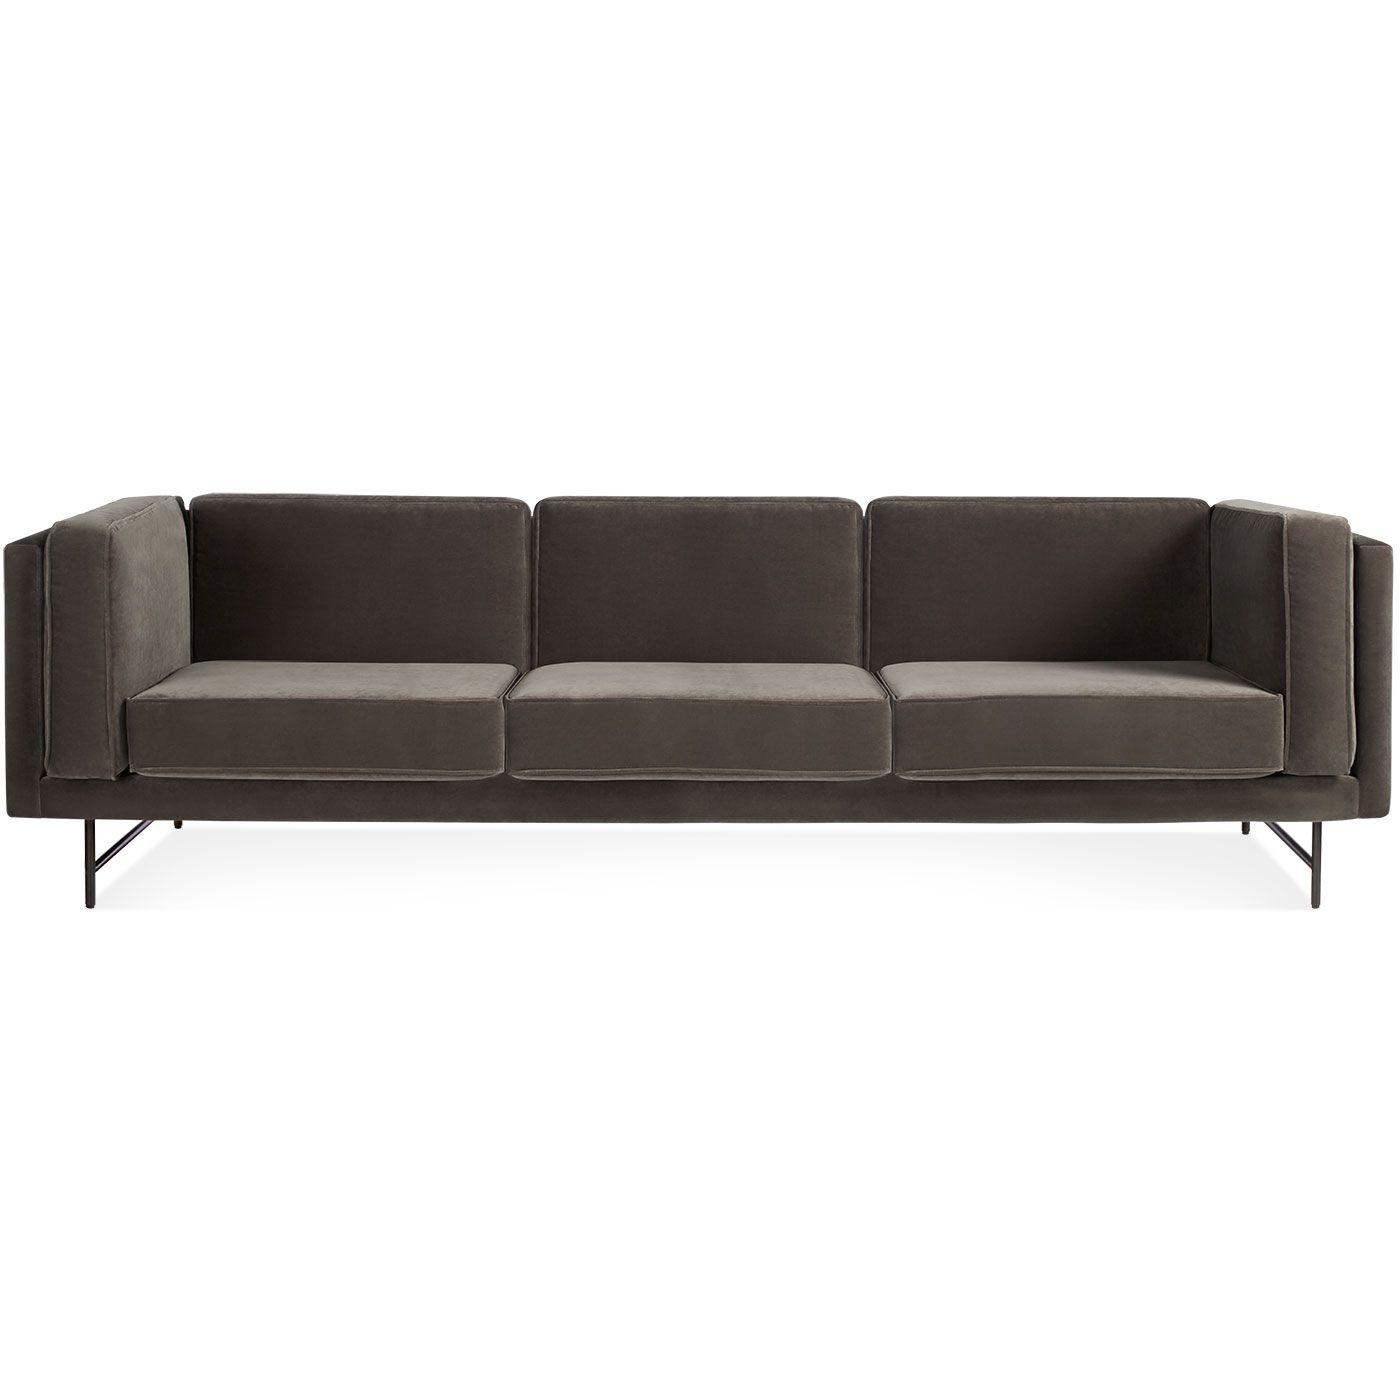 Bank 96 Quot Velvet Sofa Modern Sleeper Sofa Contemporary